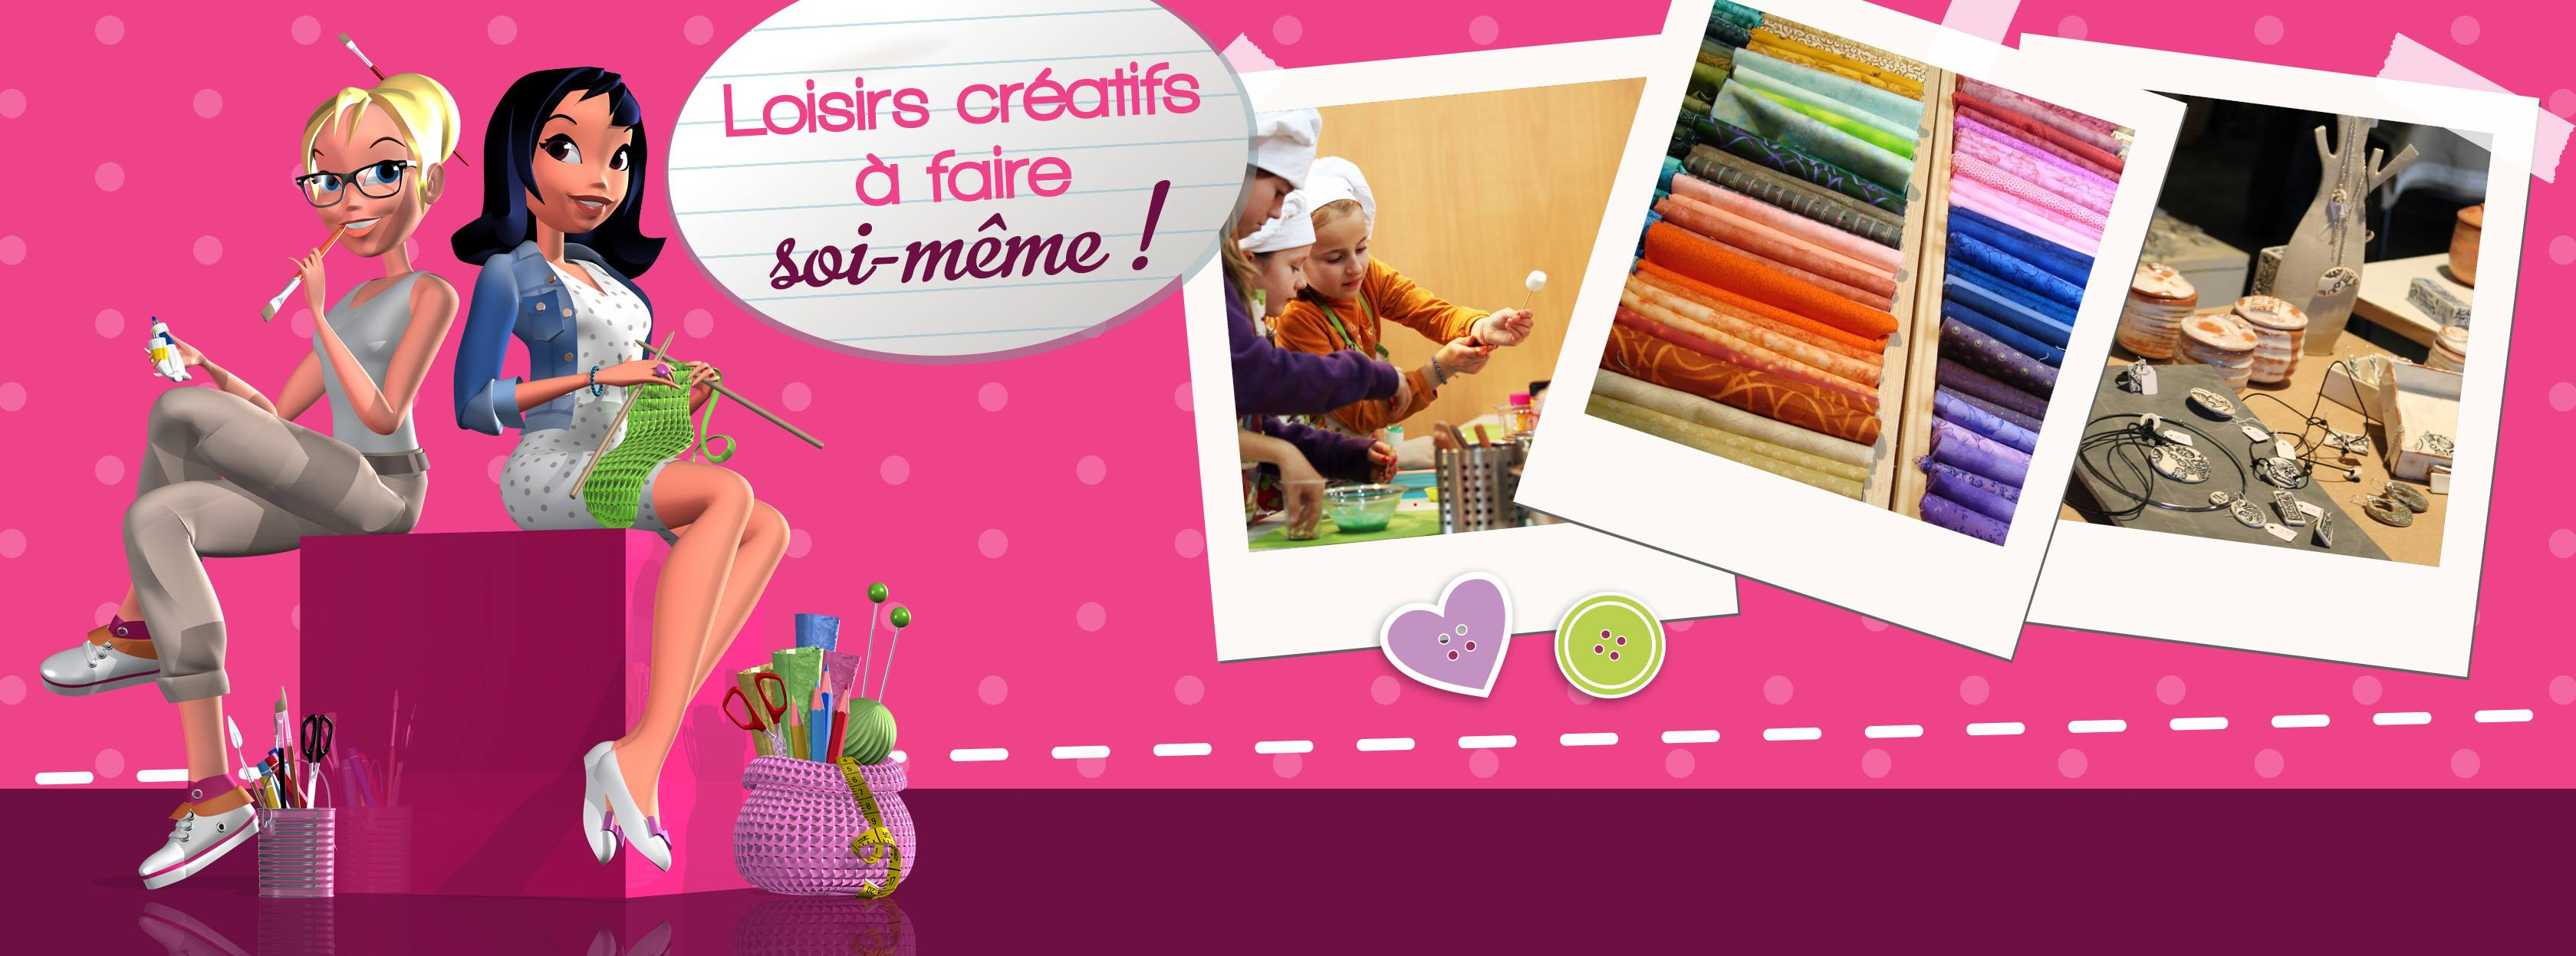 Programme 2018 aux petits loisirs for Salon creativa montpellier 2017